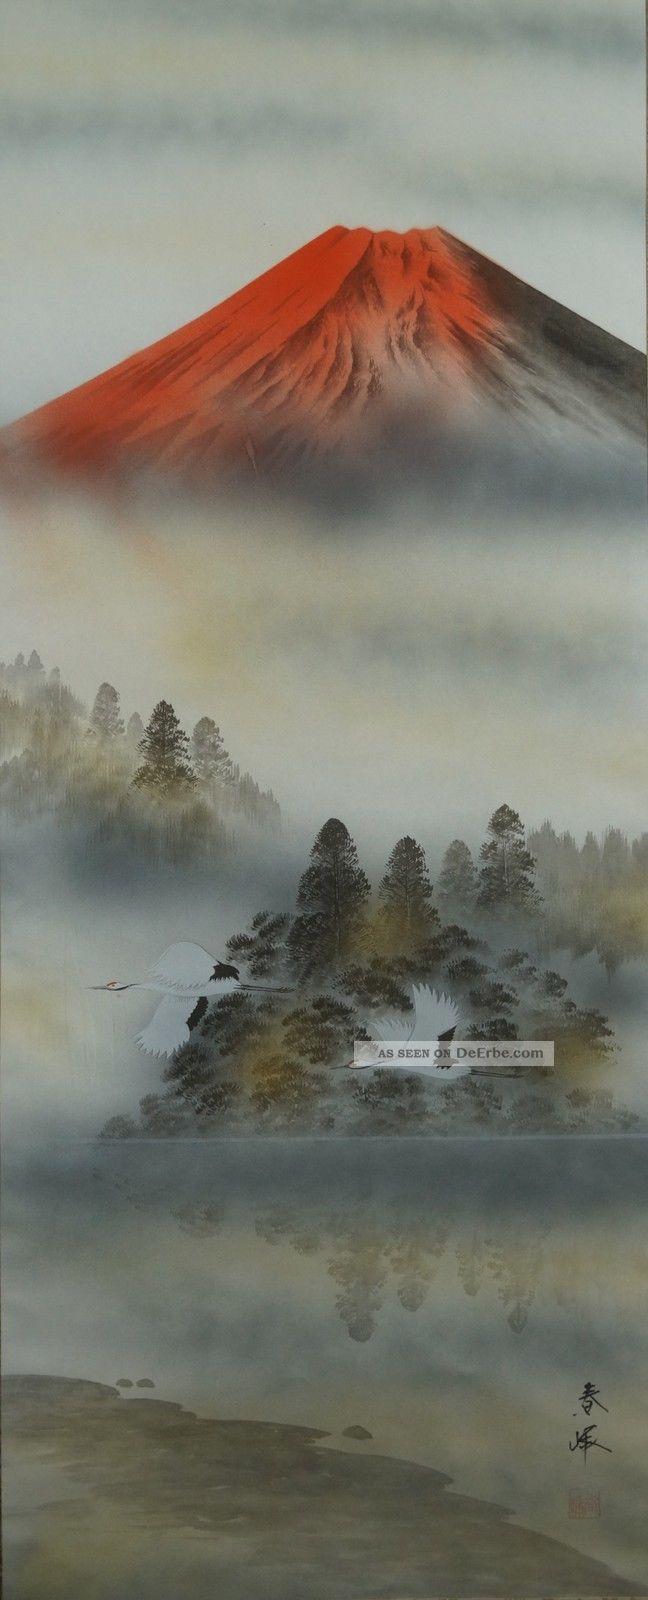 Antikes Japanisches Rollbild Kakejiku Berg Fuji Japan Scroll 3622 Asiatika: Japan Bild